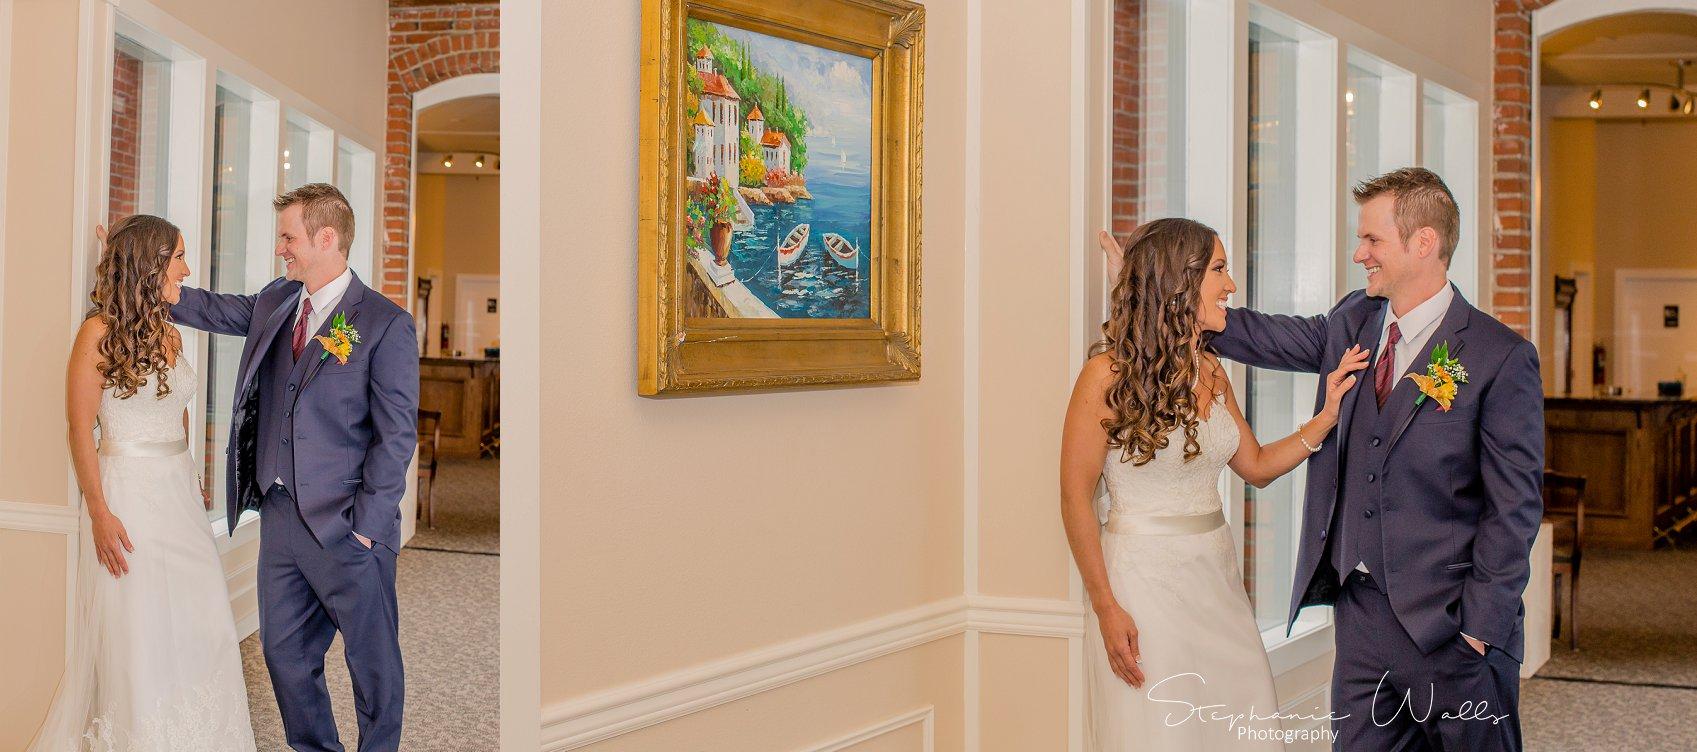 1st look Bridals 047 2 KK & Zack   Hollywood Schoolhouse Wedding   Woodinville, Wa Wedding Photographer